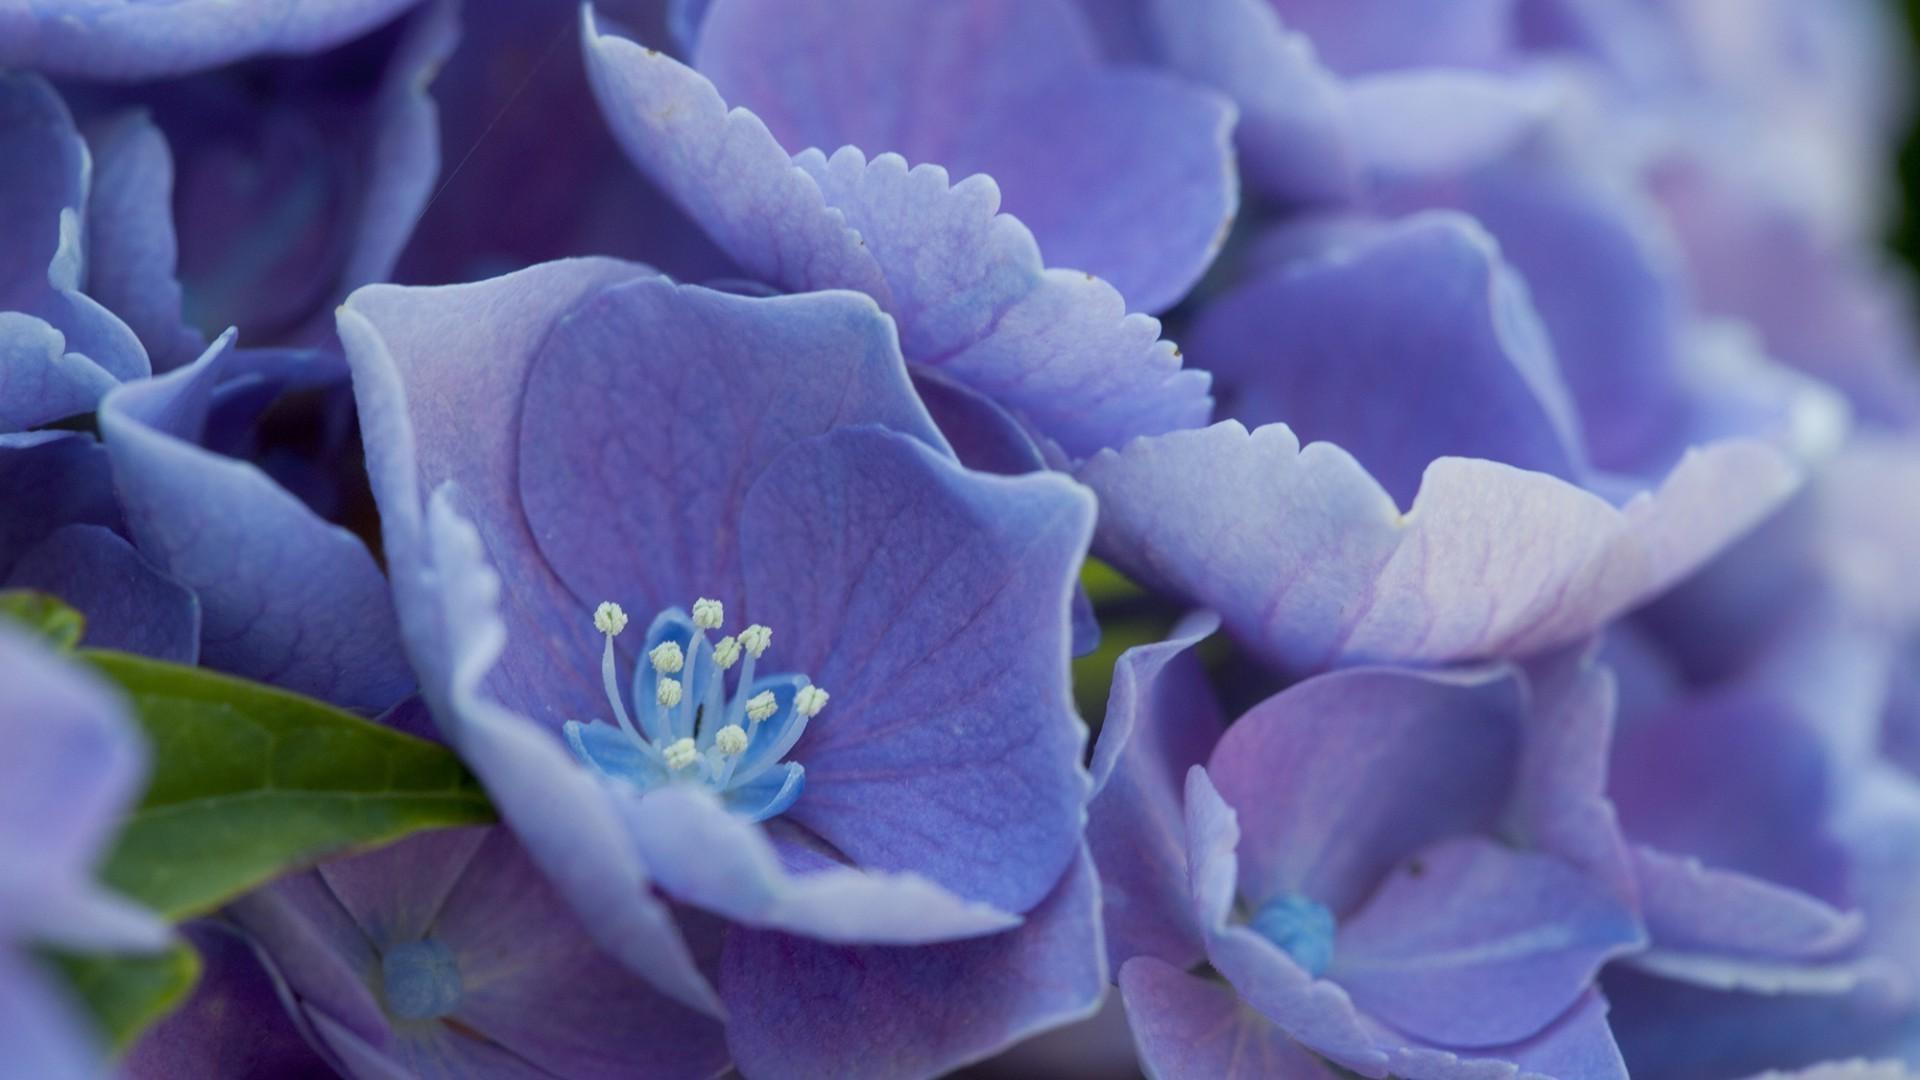 Мужчину открытки, картинки цветы голубые